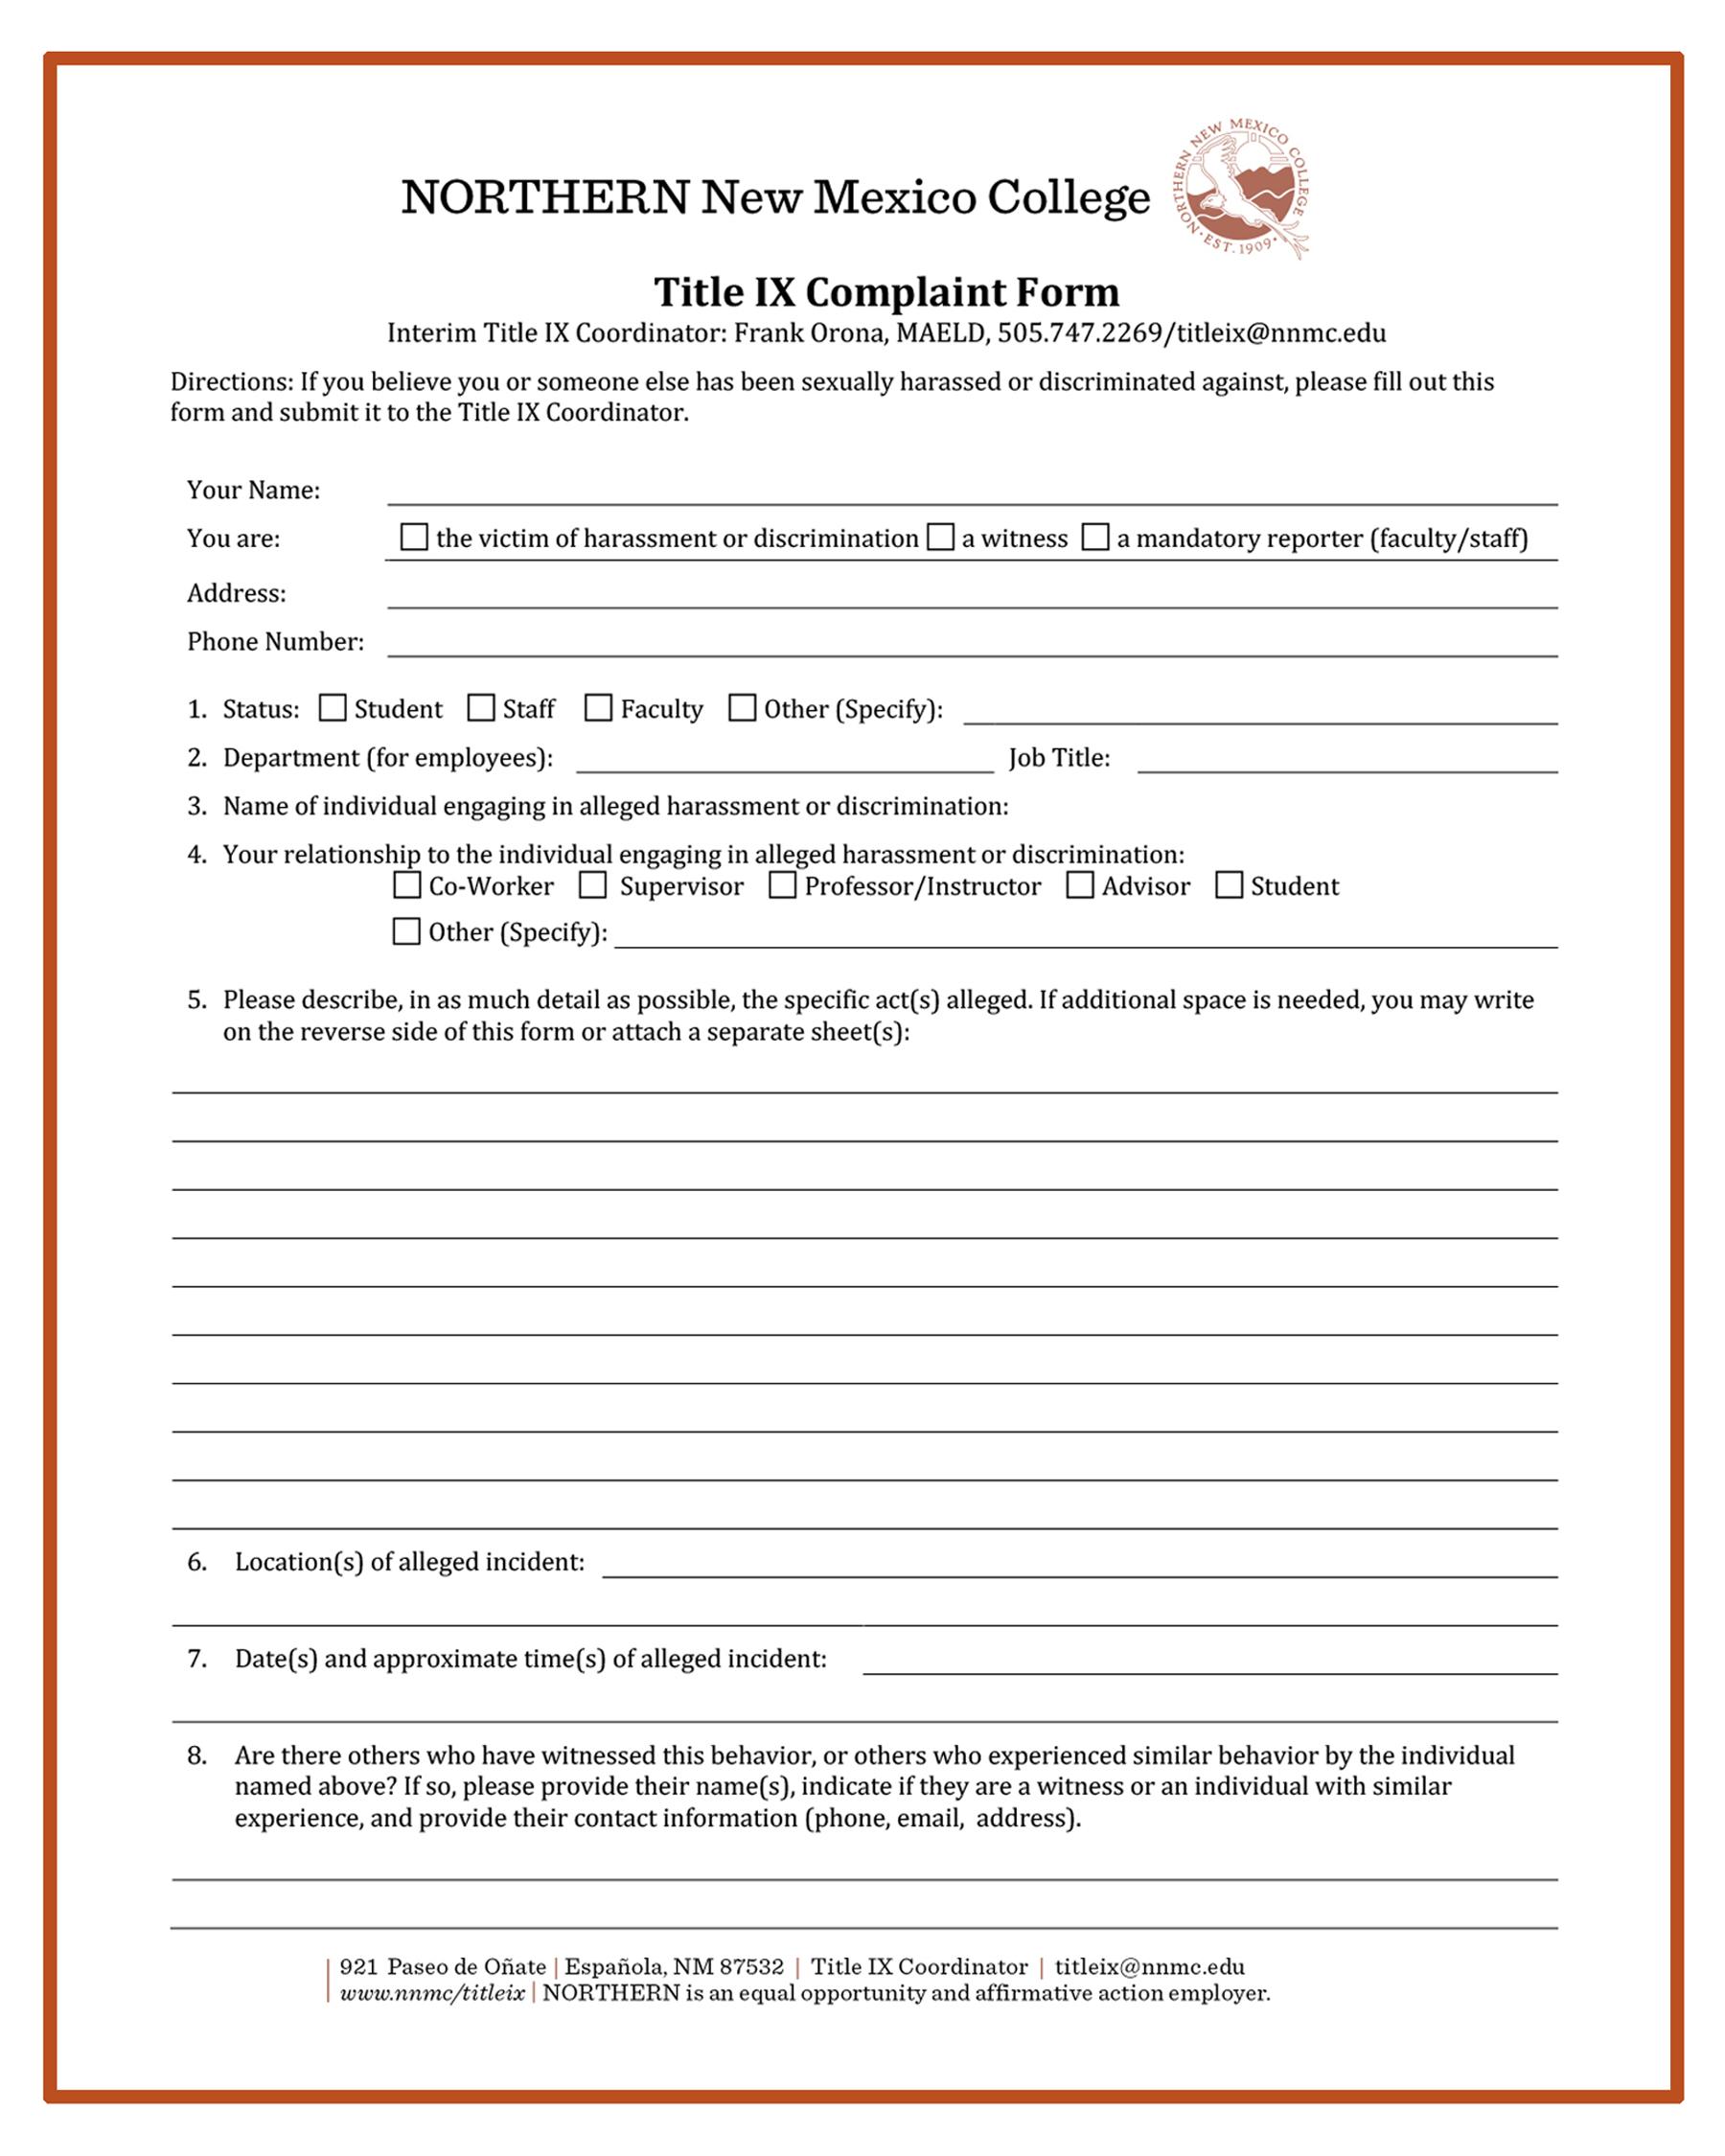 ix title form complaint grievance nnmc edu student northern mexico coordinator